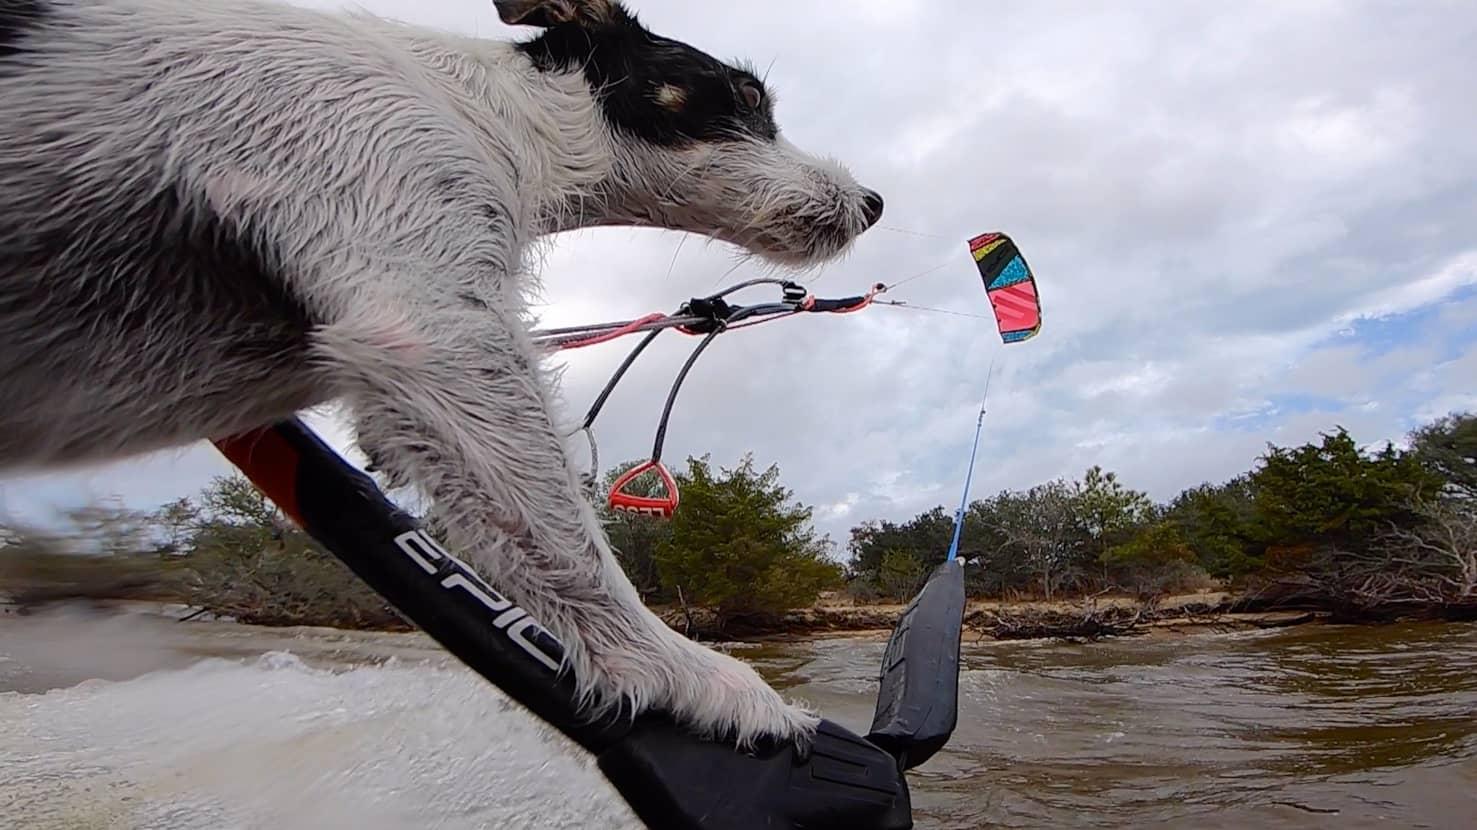 ZEUS the Surfing & Kitesurfing dog - with Epic Kites Kiteboarding